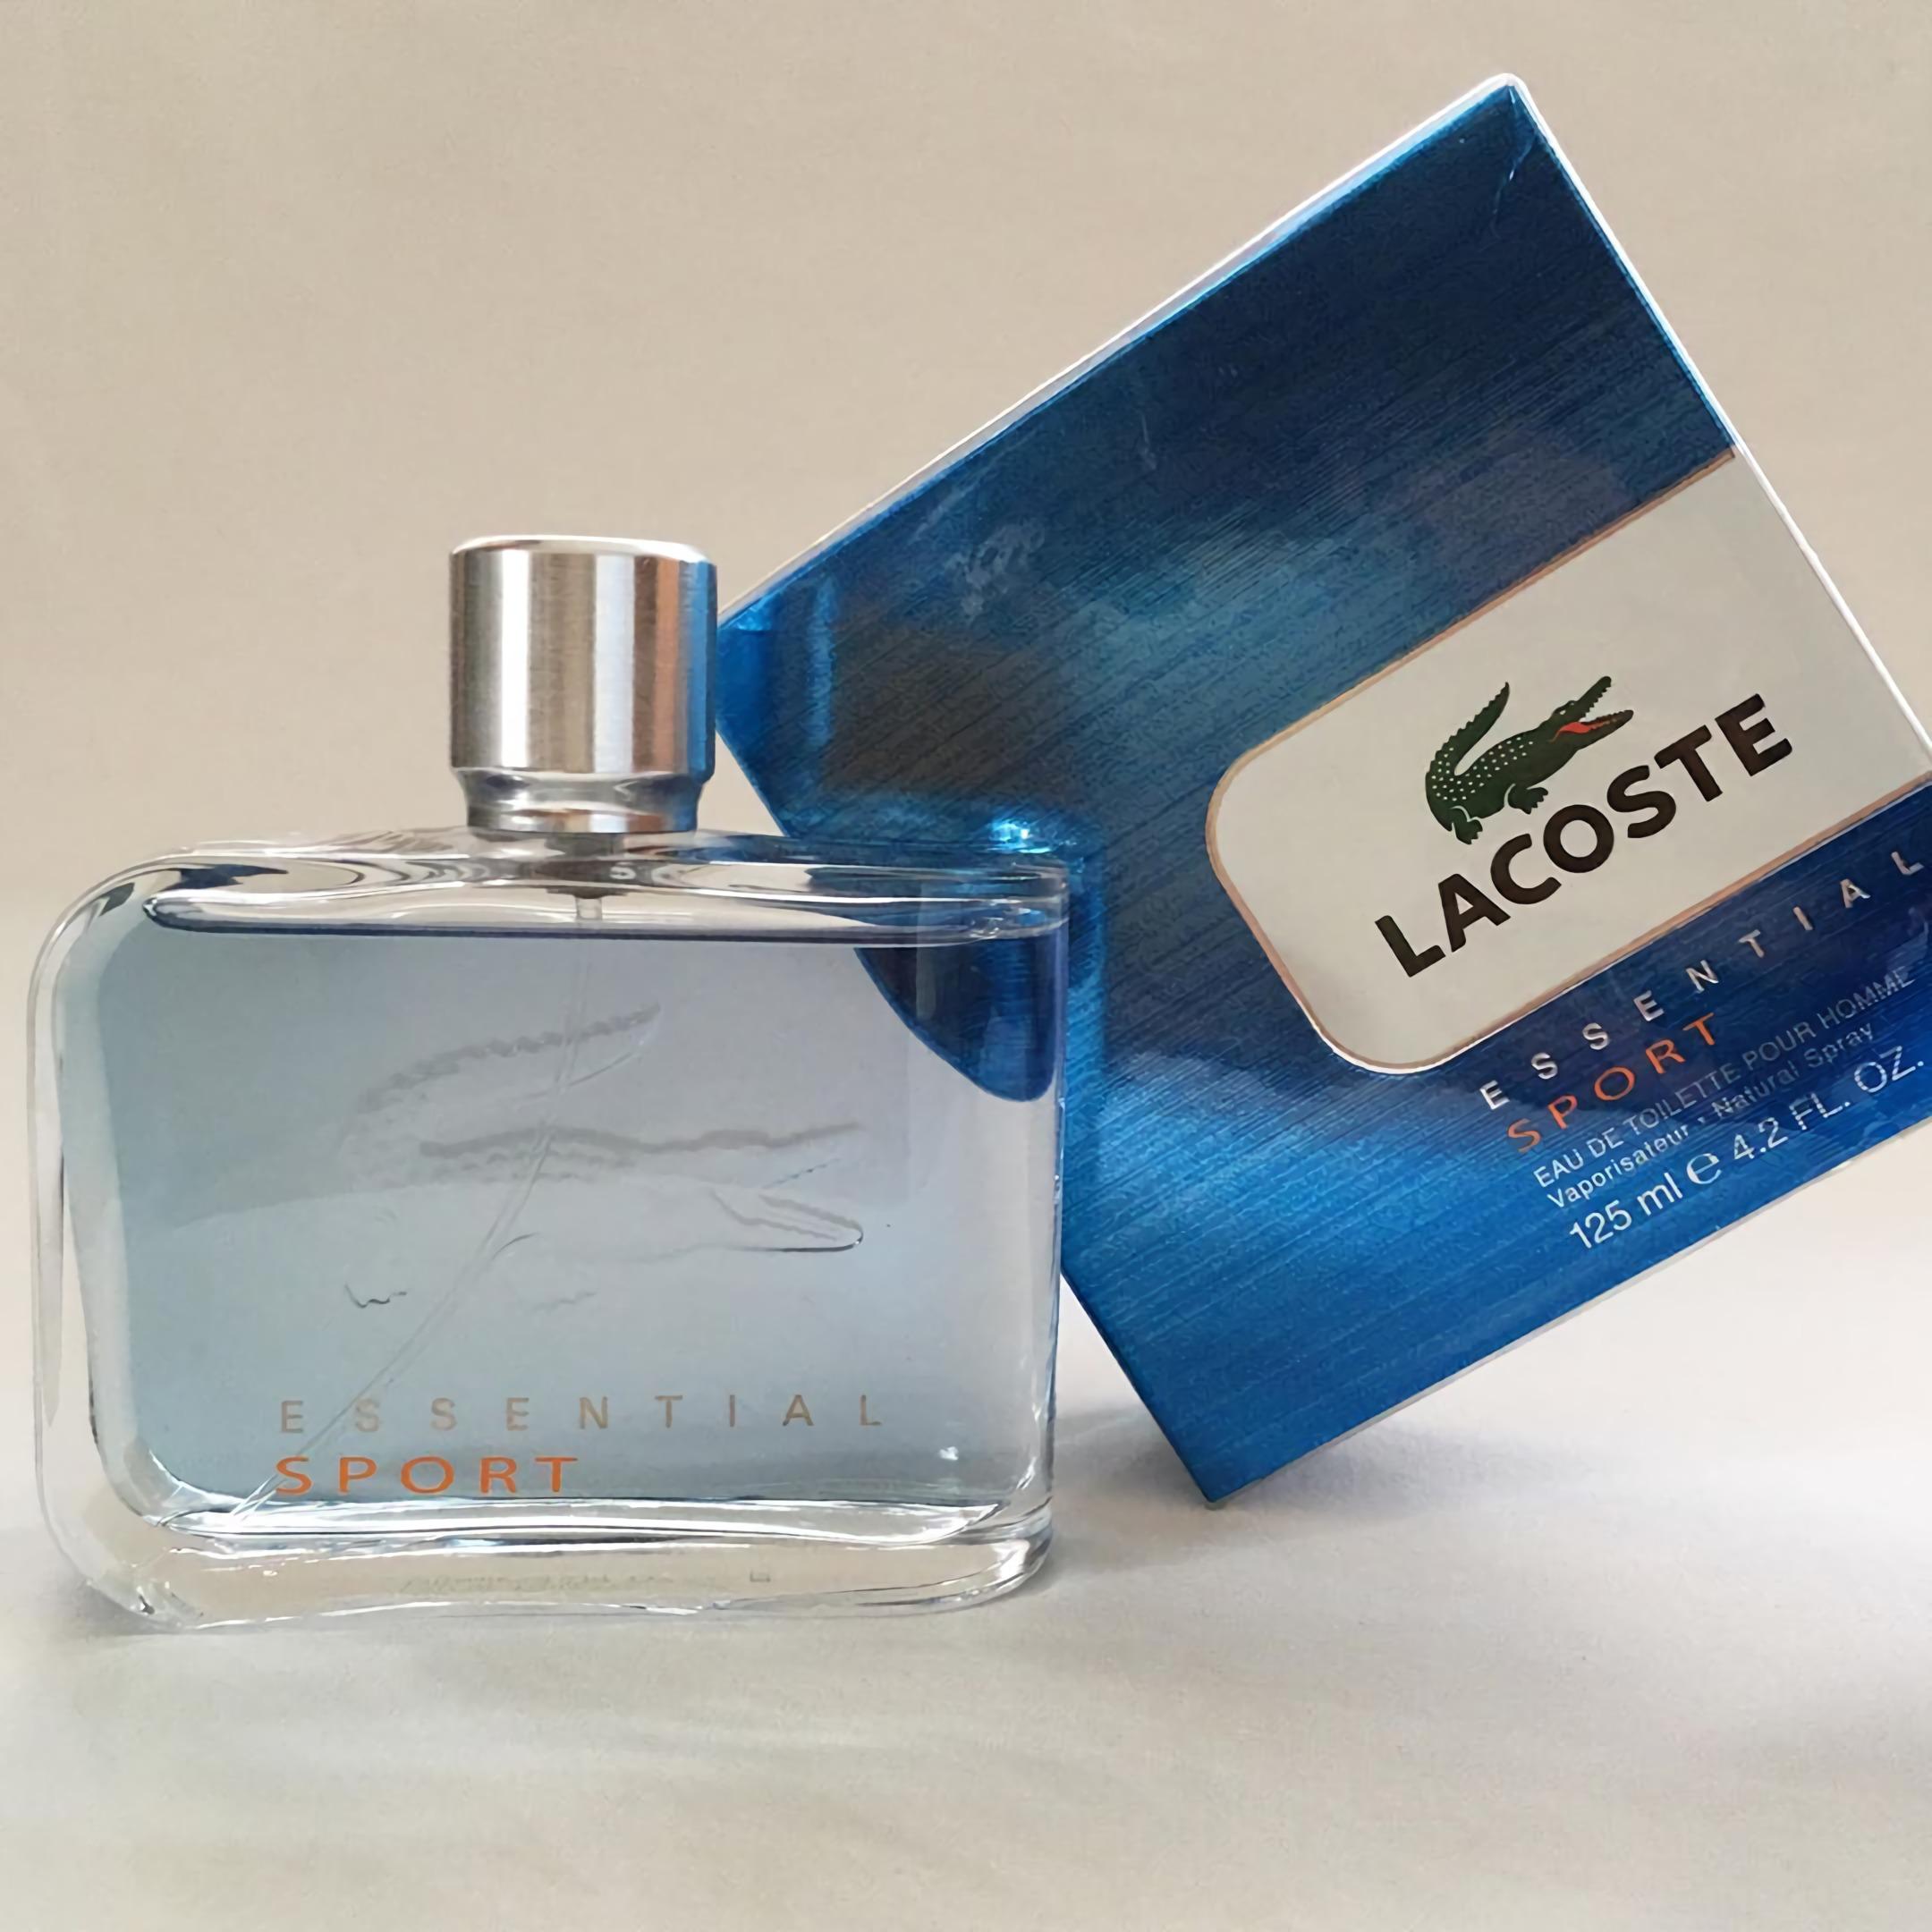 духи для парней Lacoste Essential Sport